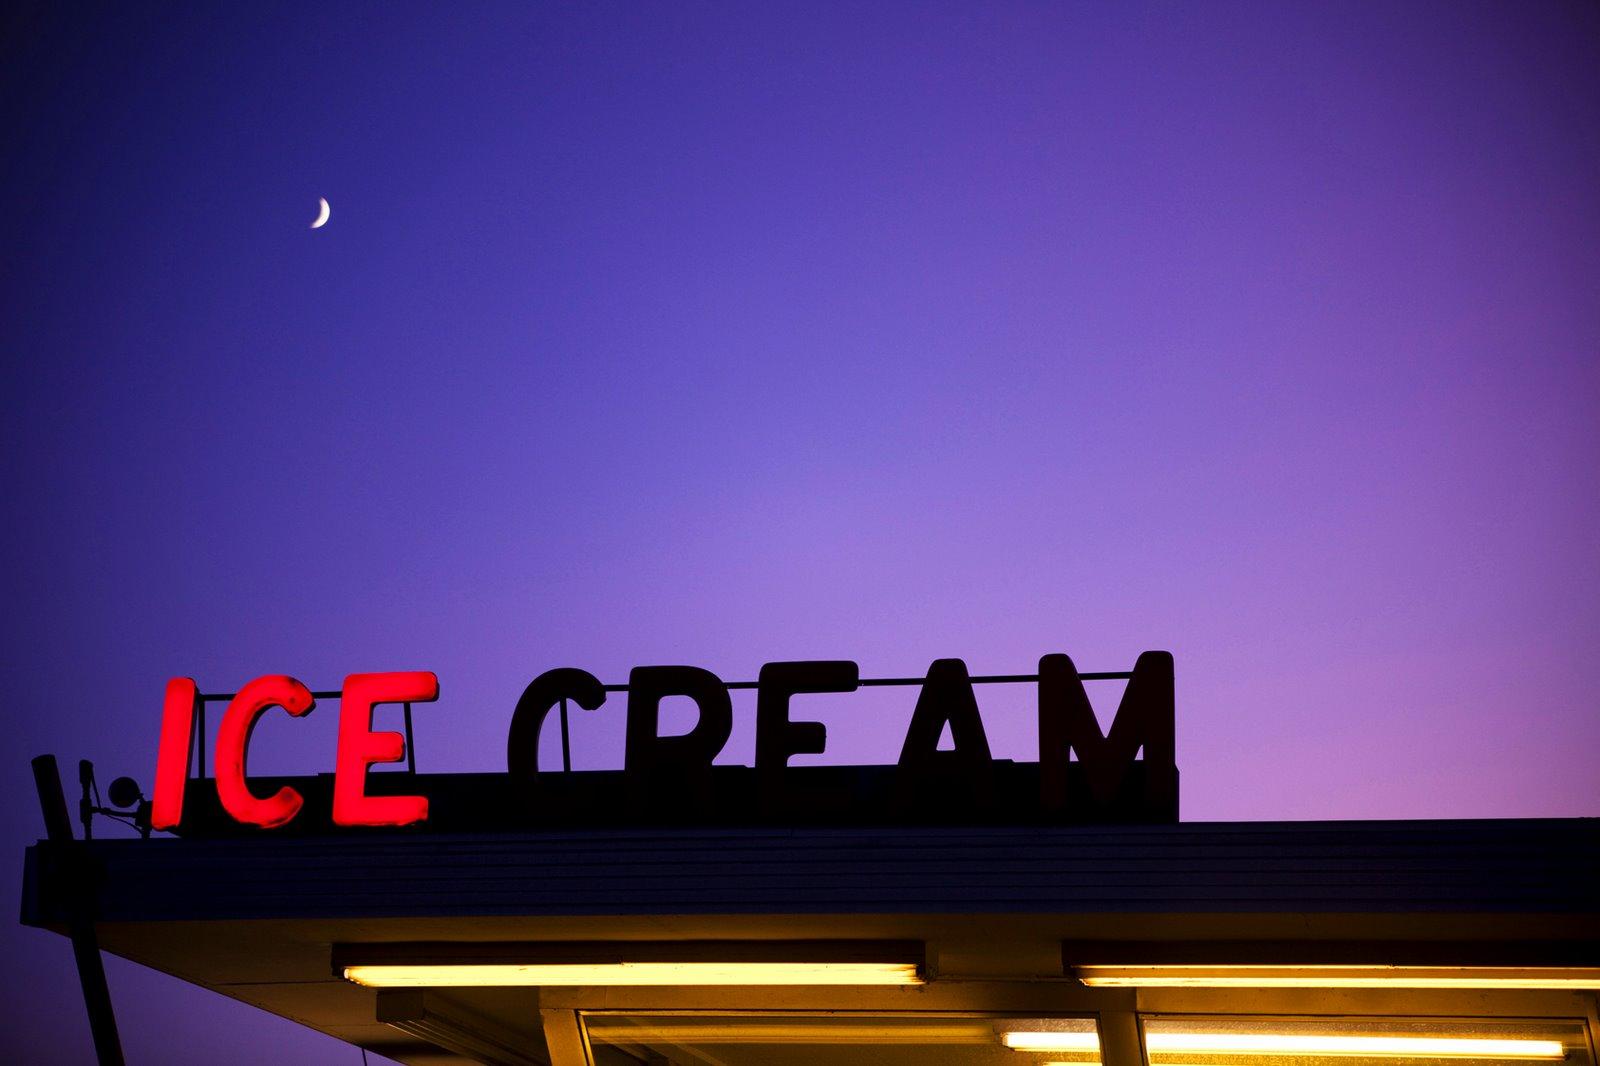 [icecream.jpg]